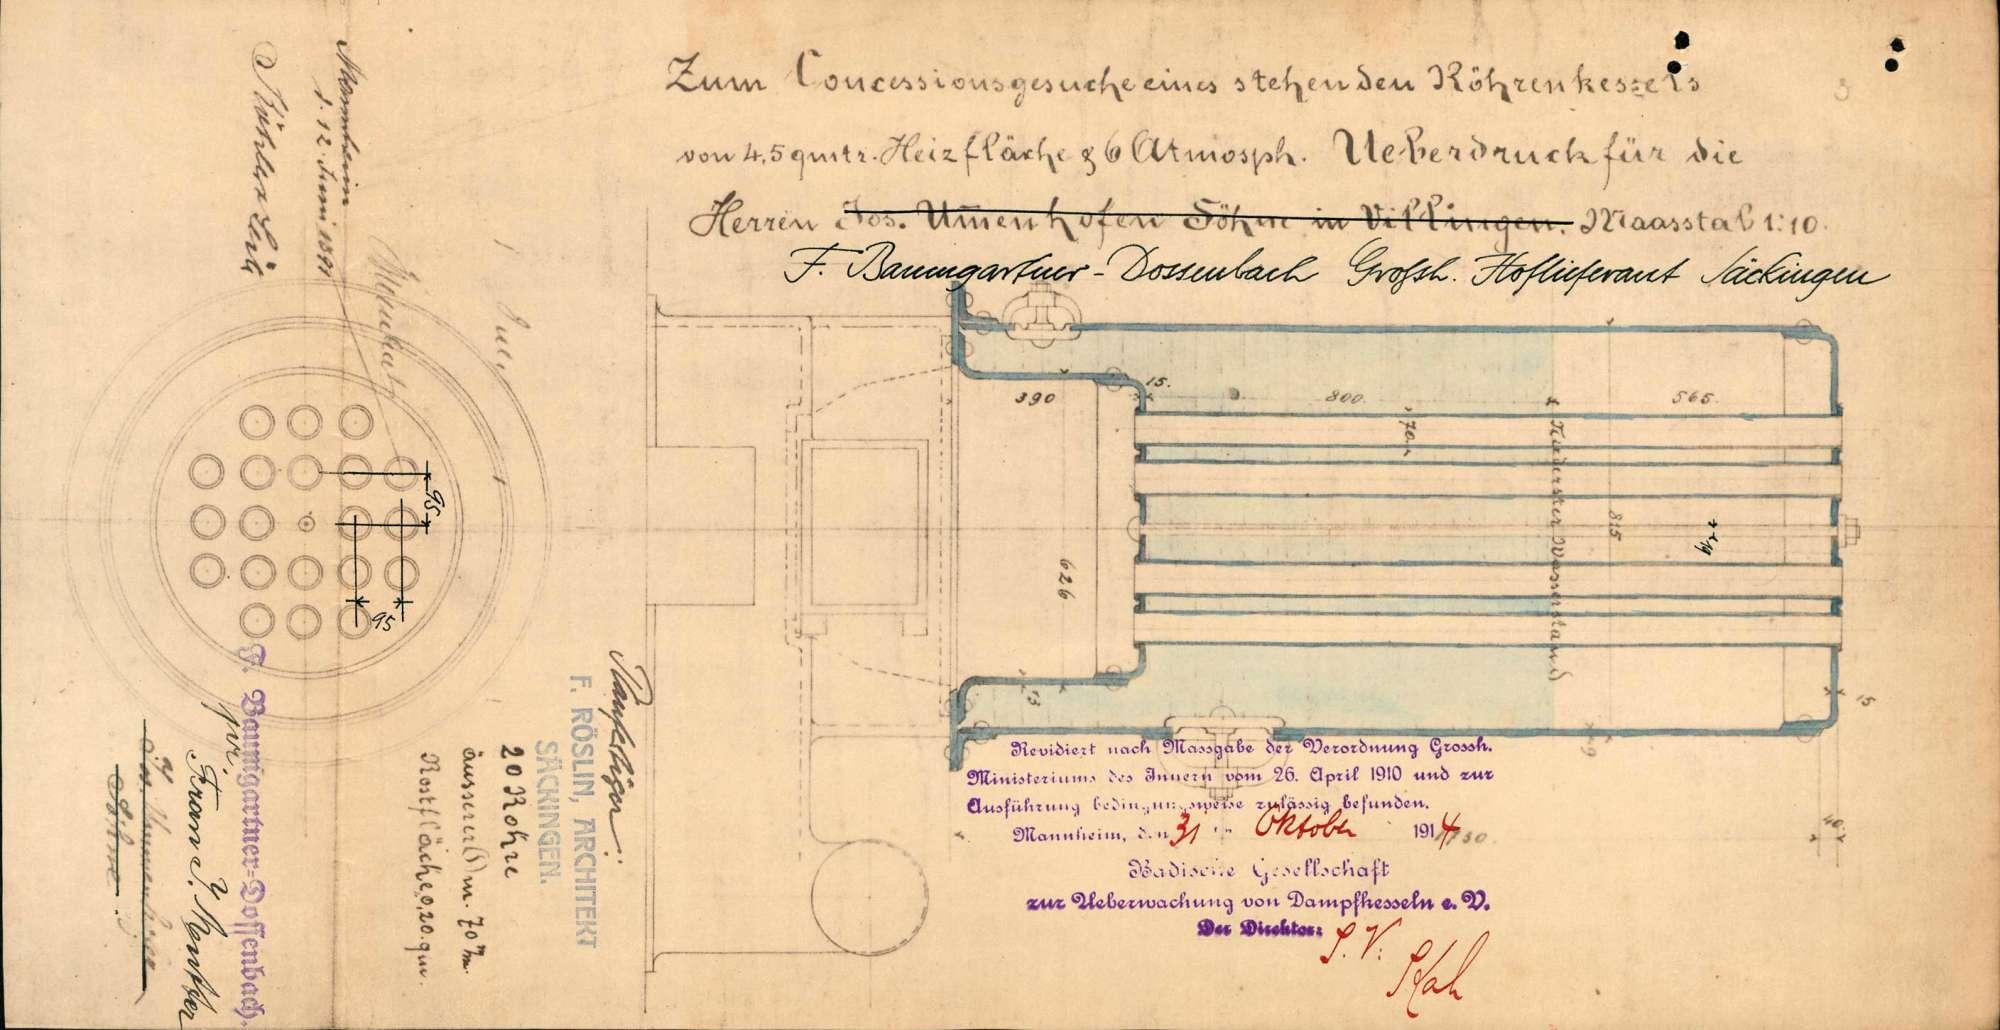 Dampfkessel der Firma Baumgartner-Dossenbach in Säckingen, Bild 1